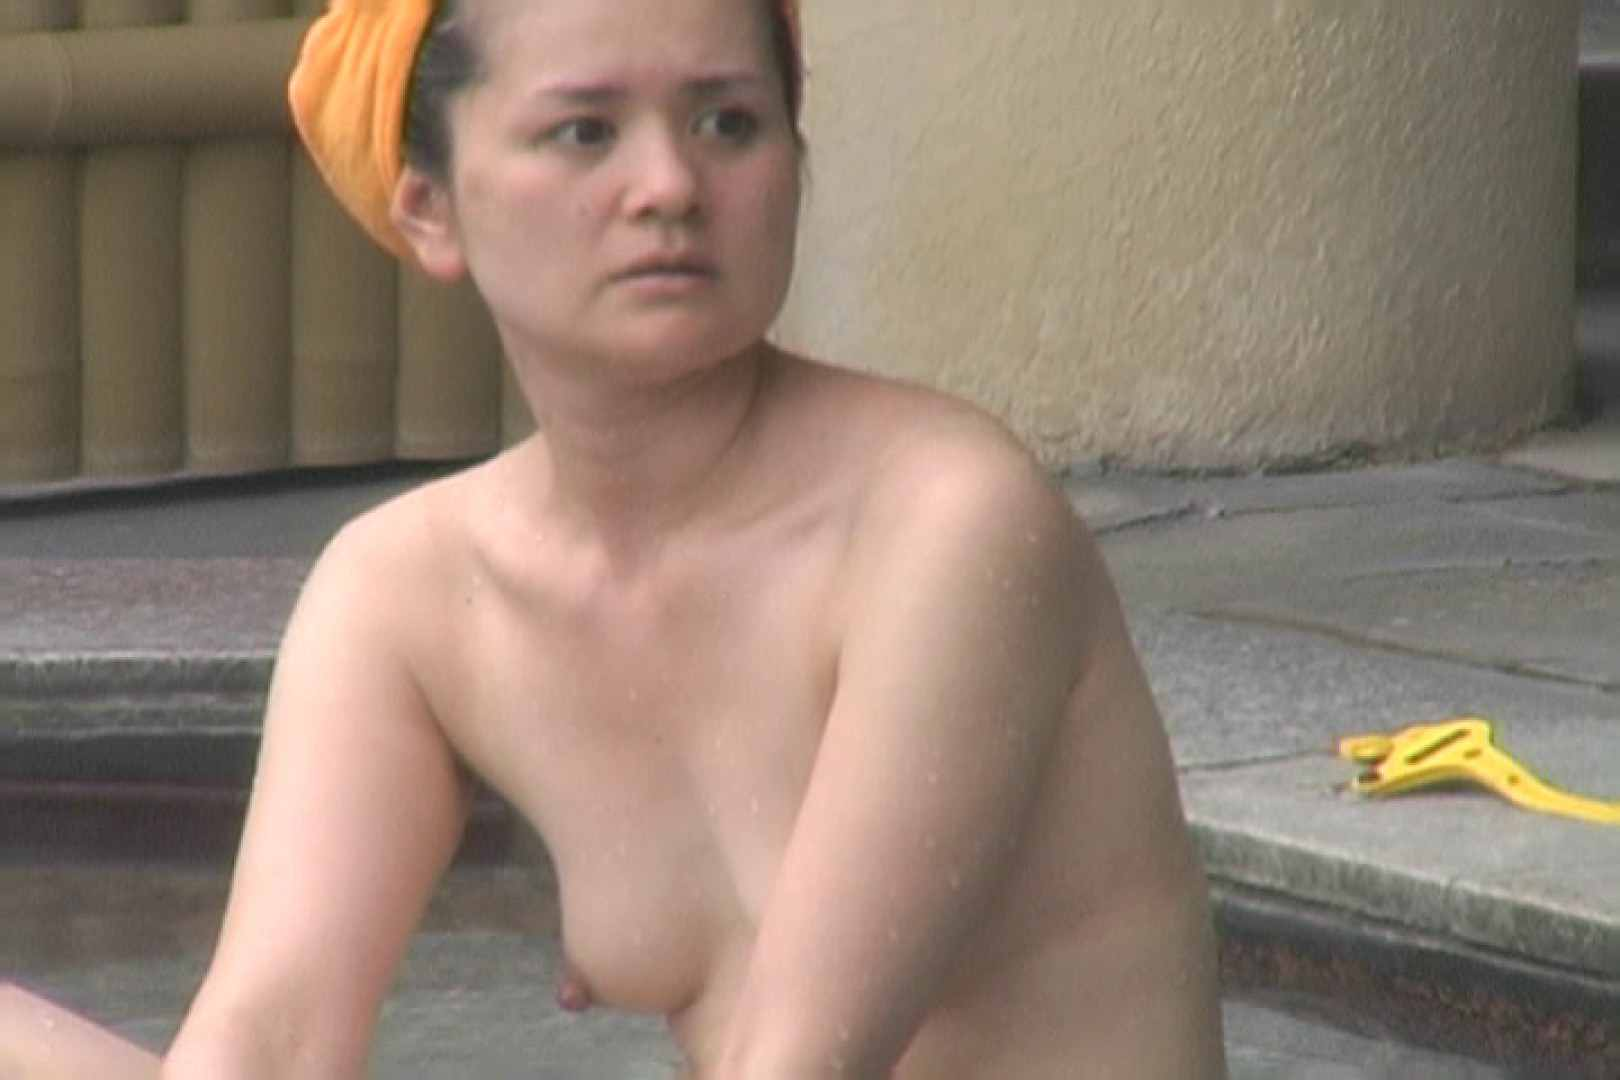 Aquaな露天風呂Vol.640 エッチな盗撮 セックス画像 101pic 62